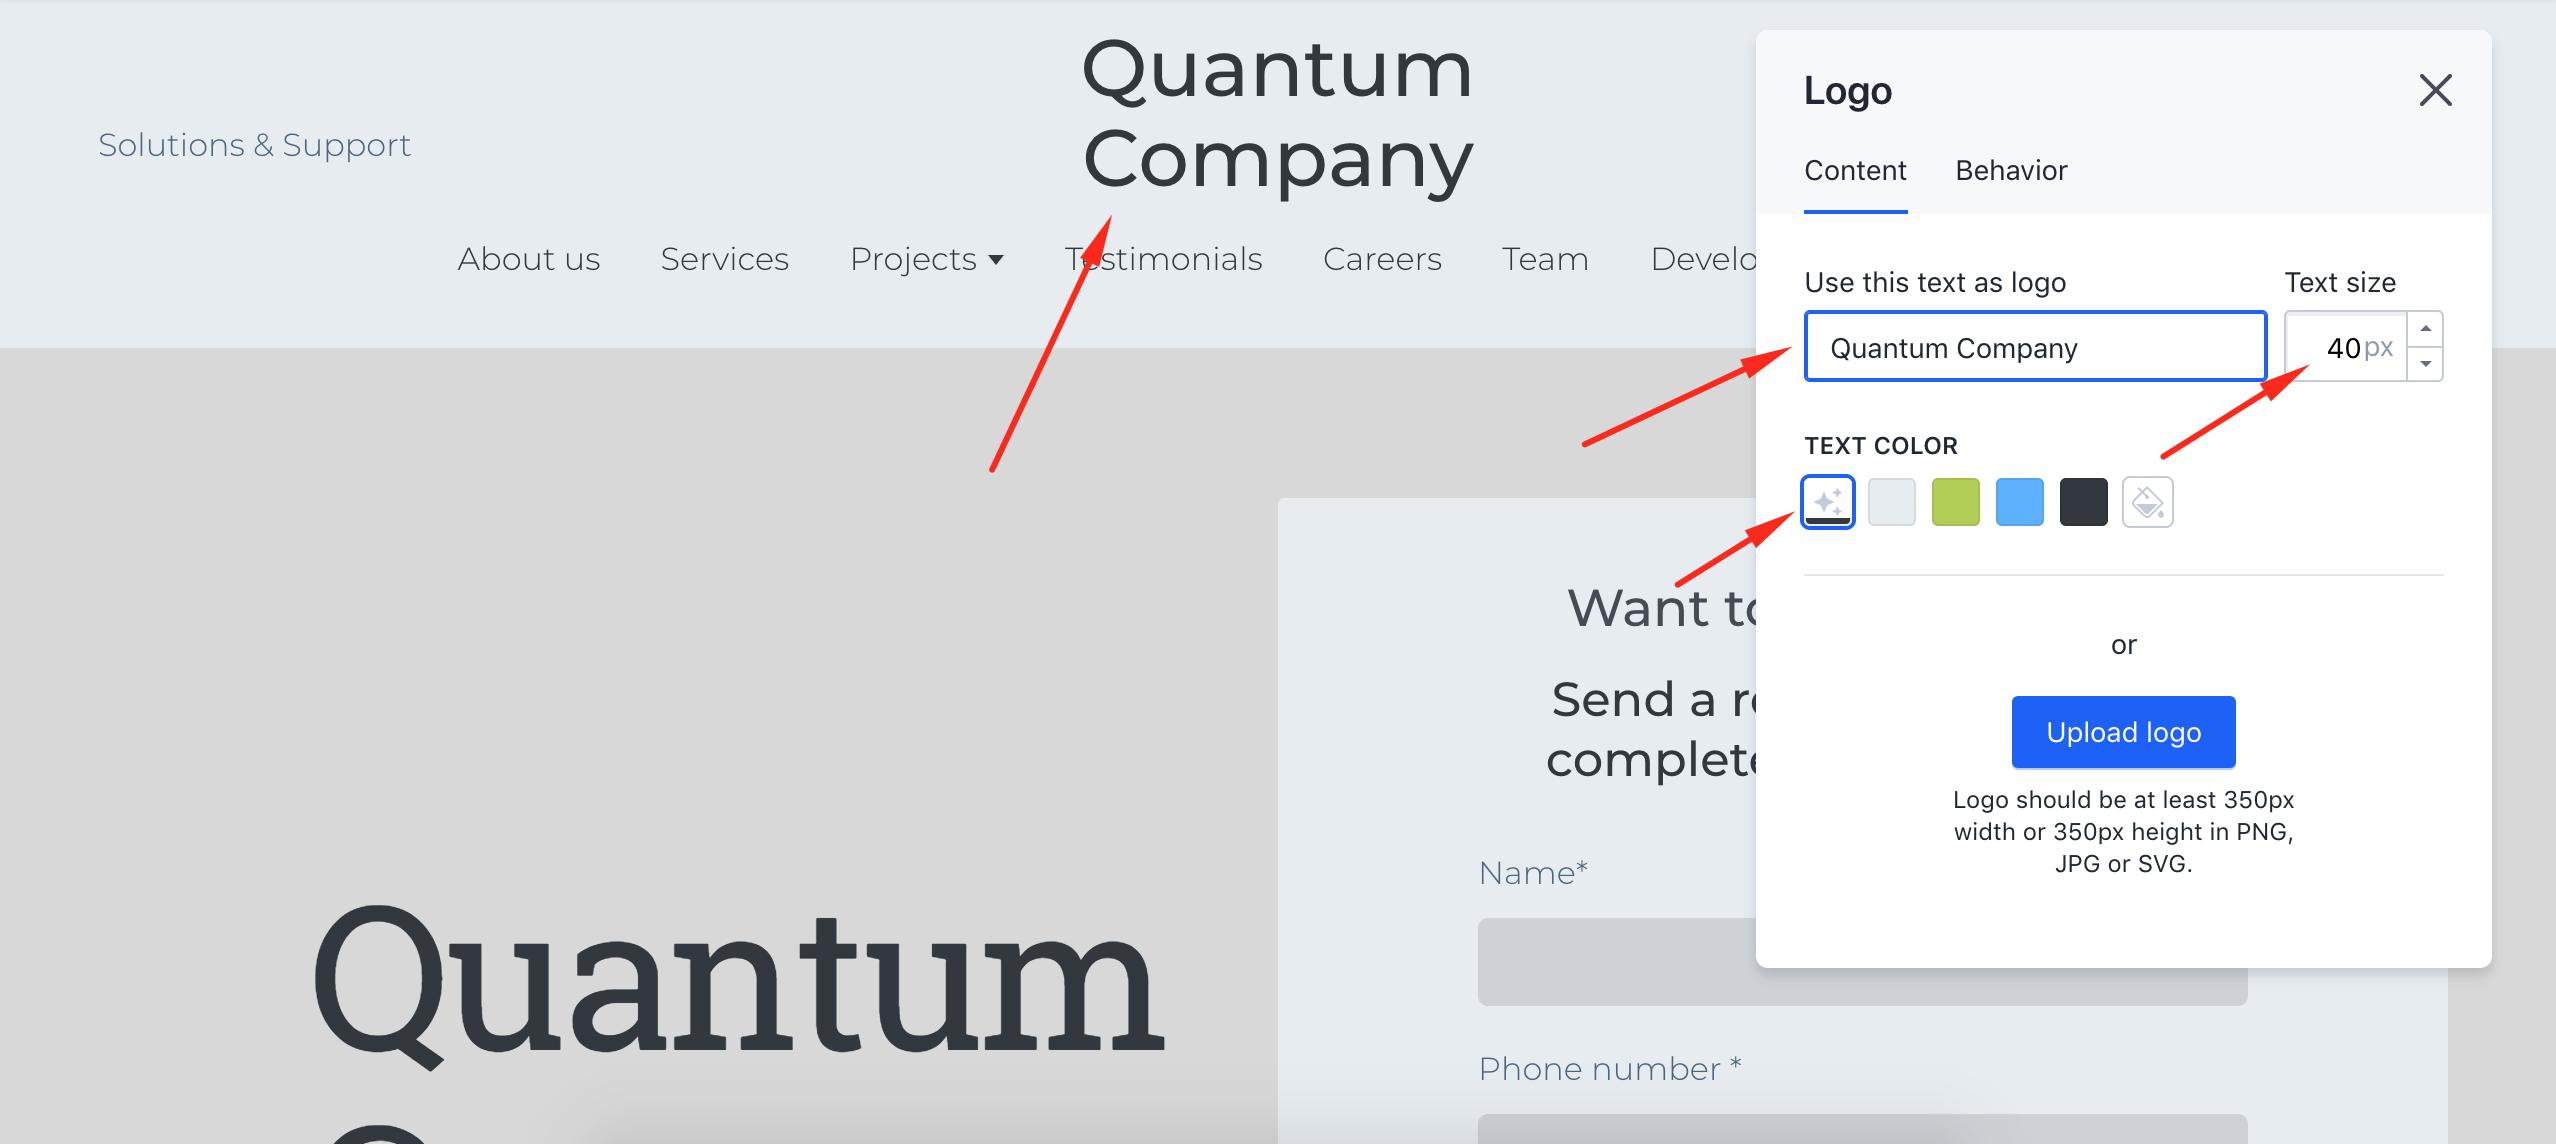 Create a text logo - Weblium